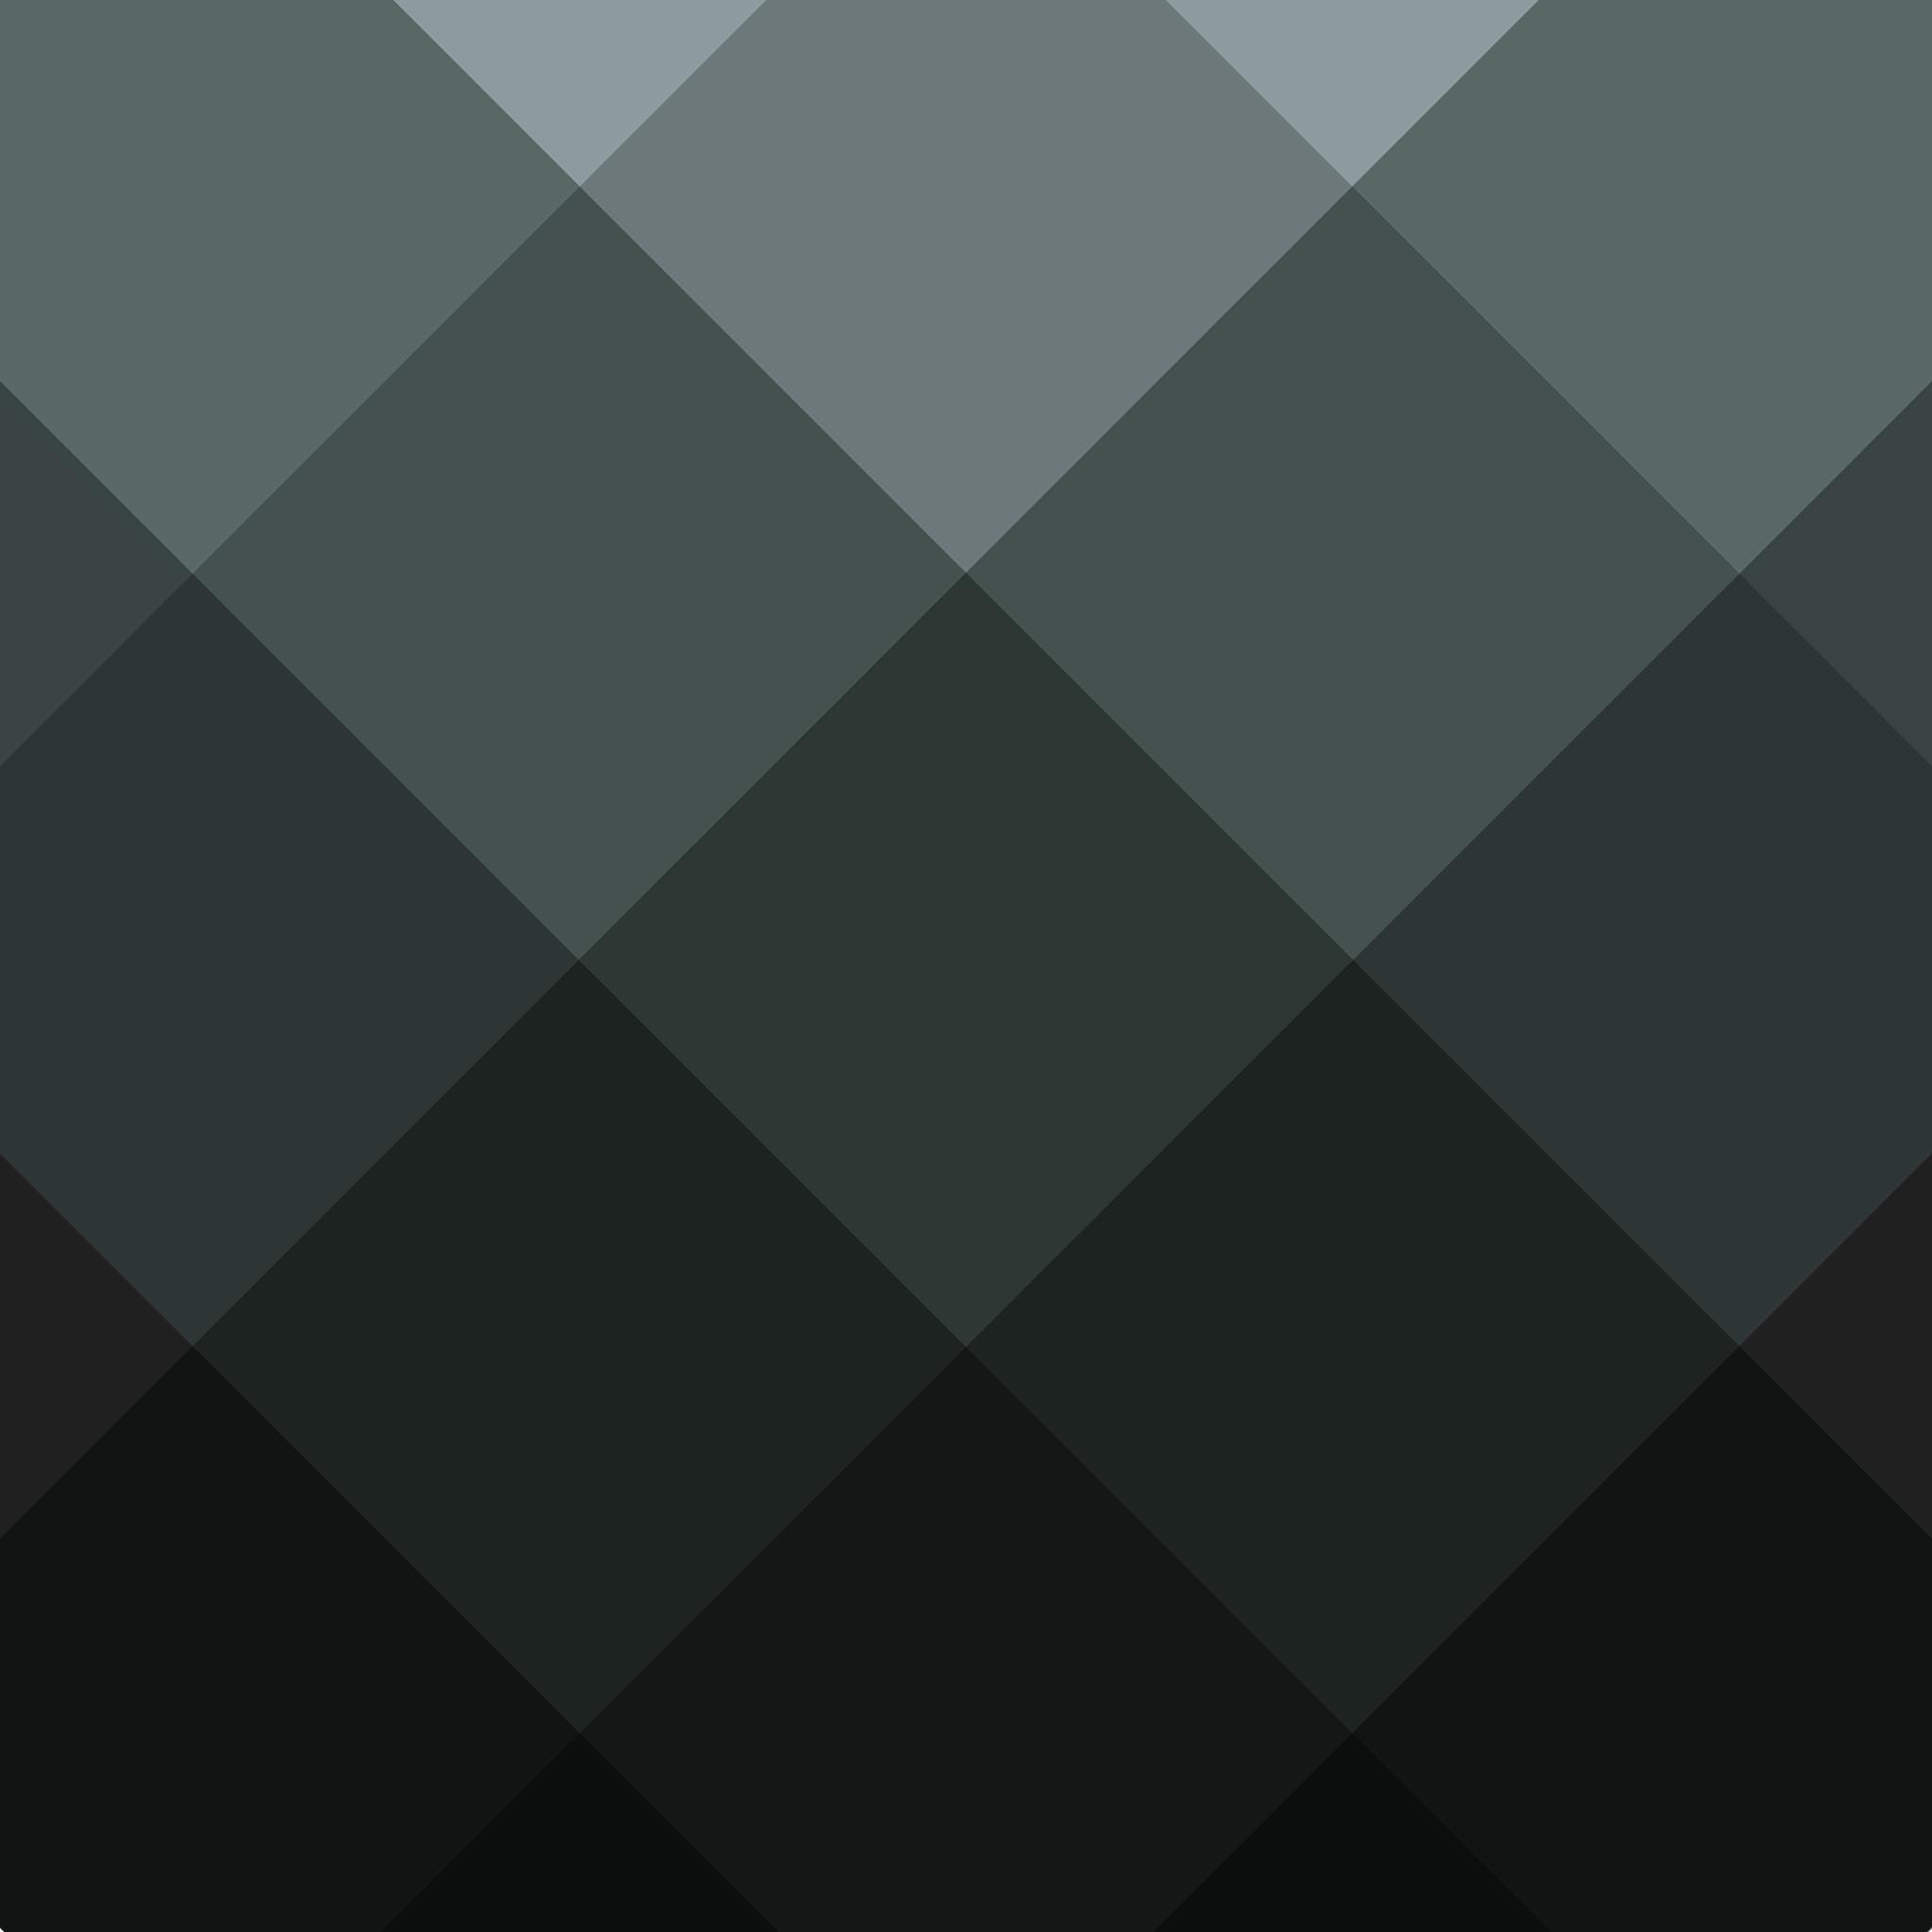 Ipad Mini Wallpapers Hd Retina Ready Stunning Wallpapers Auto Design 2048x2048